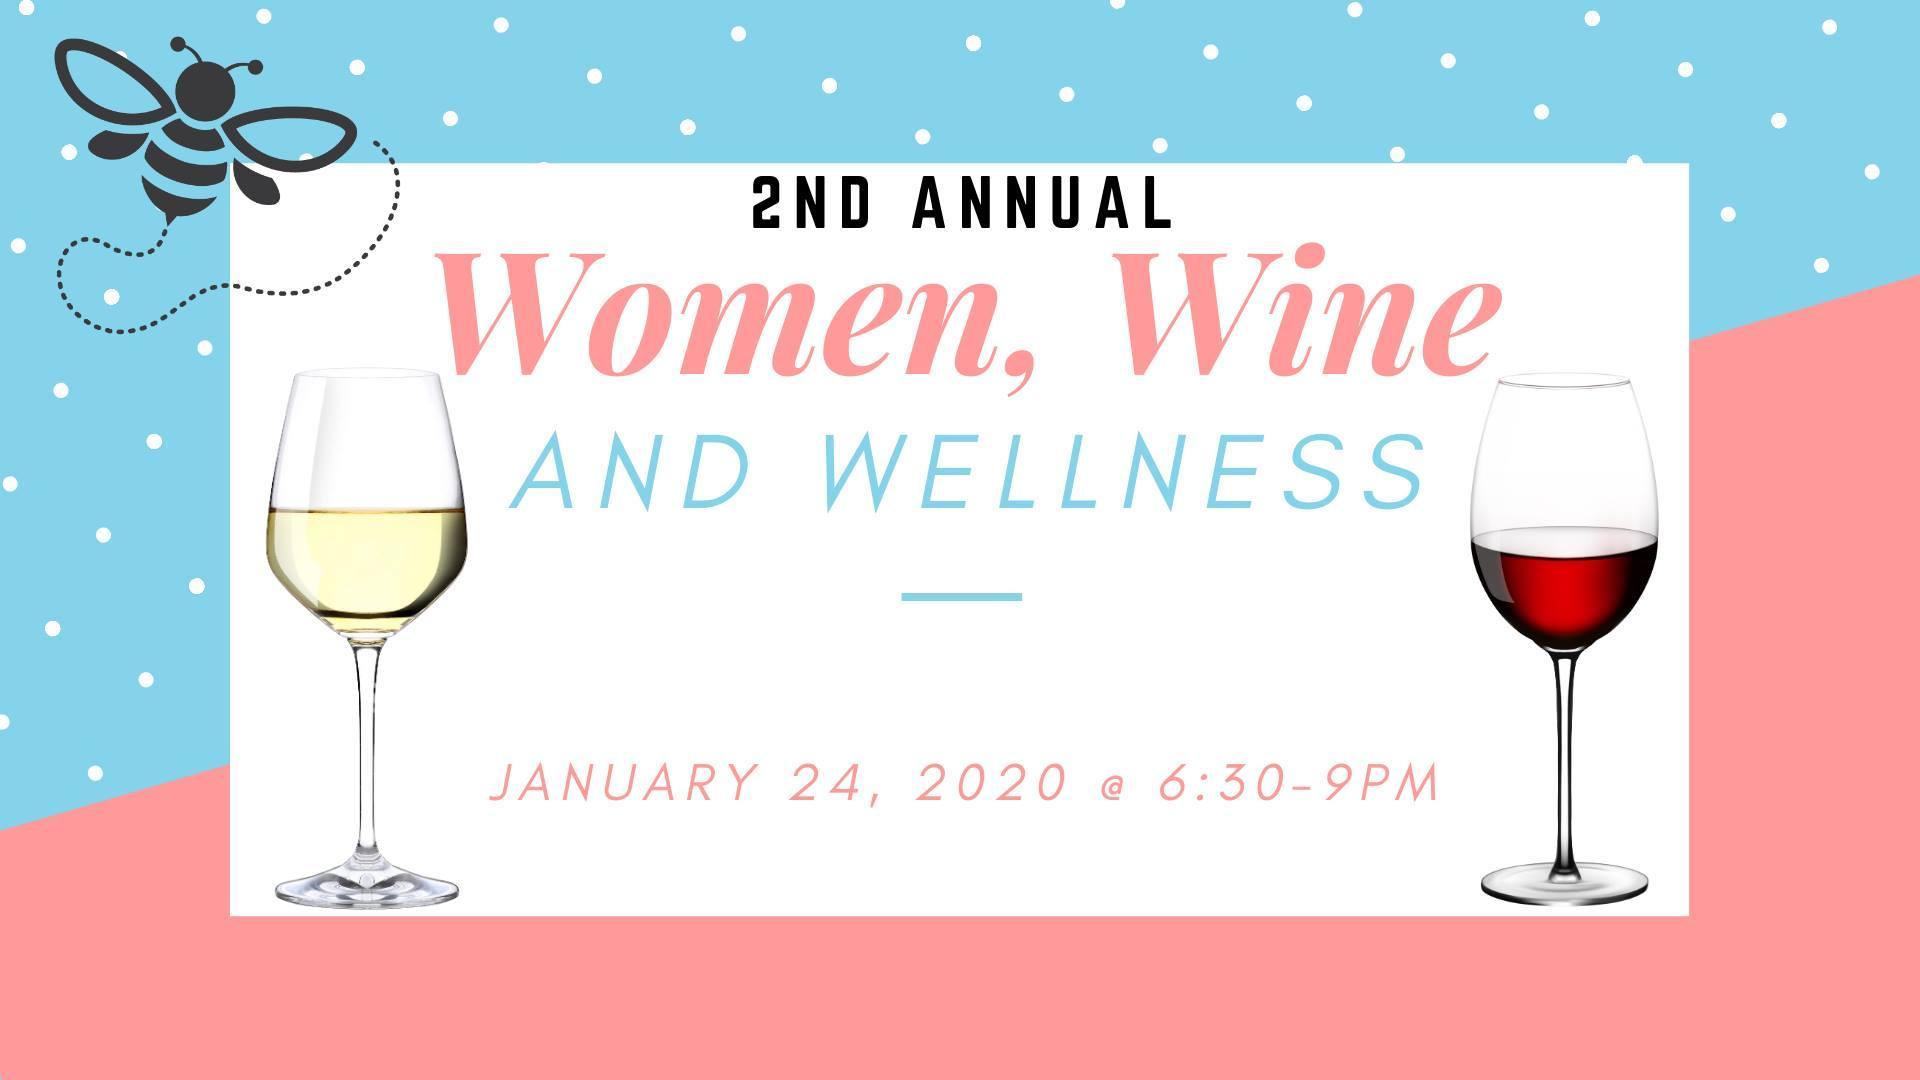 2nd Annual Women, Wine and Wellness